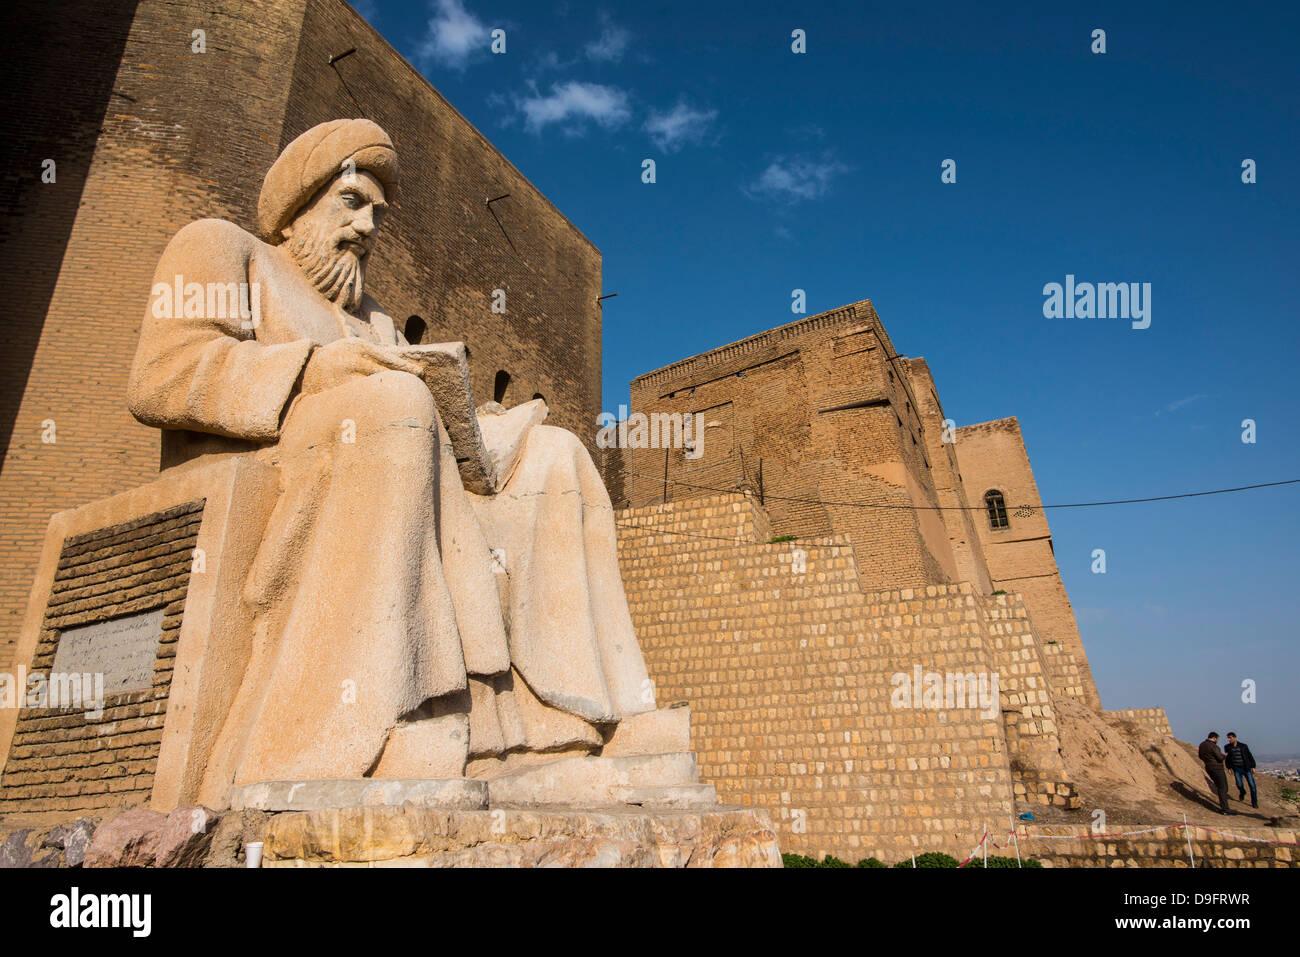 Statue of Mubarek Ahmed Sharafaddin in front of the citadel of Erbil (Hawler), capital of Iraq Kurdistan, Iraq, - Stock Image